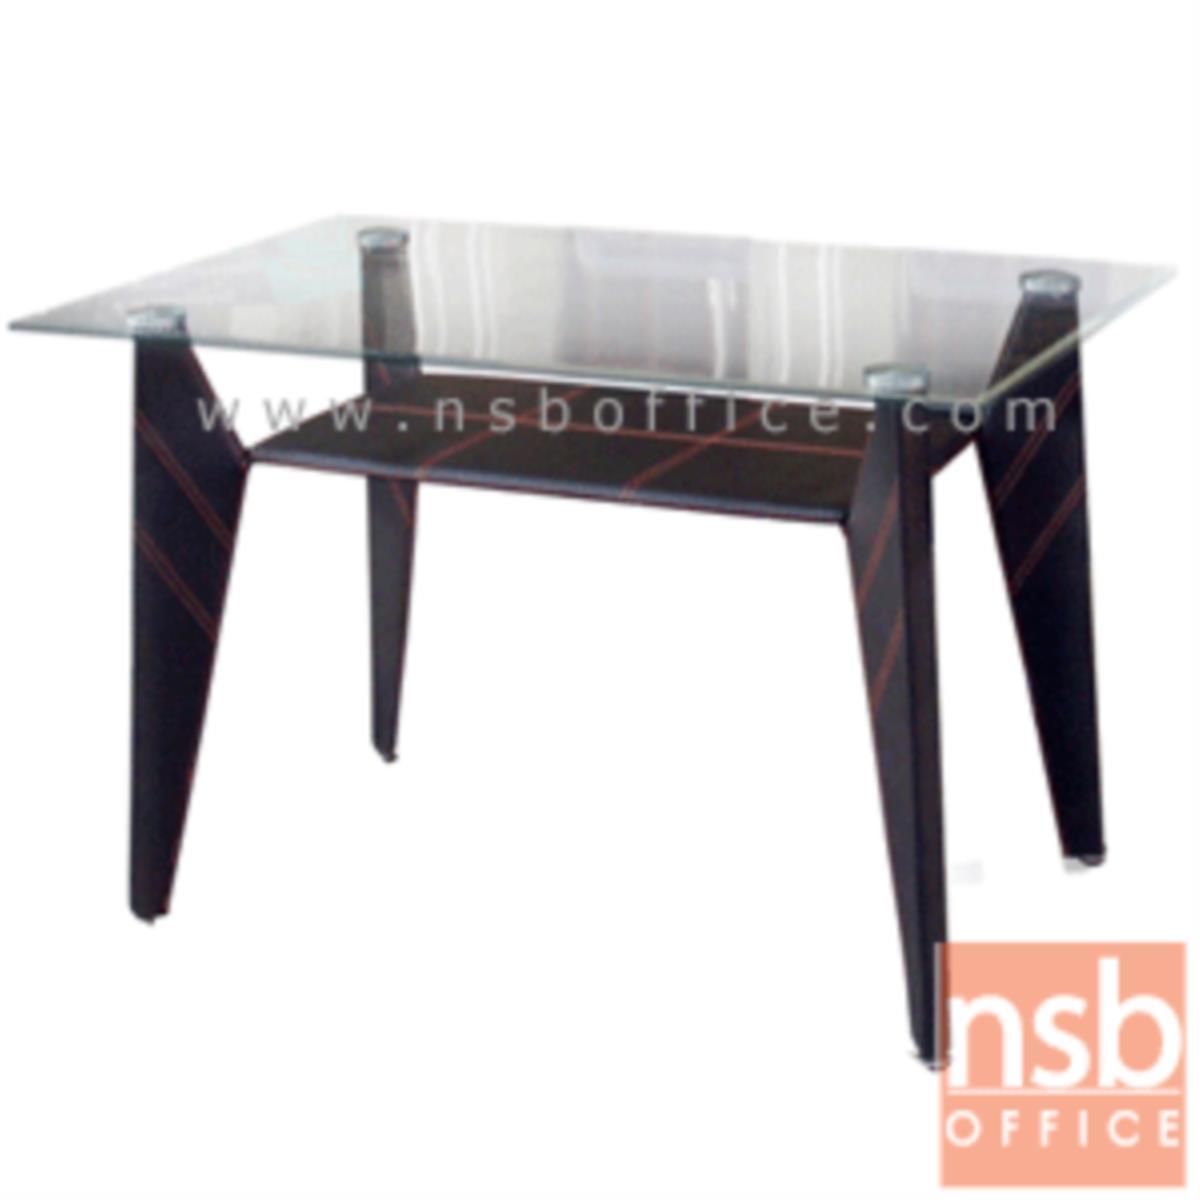 A05A114:โต๊ะประชุมเหลี่ยมหน้ากระจก รุ่น Remigio (เรมีโจ) ขนาด 120W cm.  ขาเหล็กหุ้มหนัง